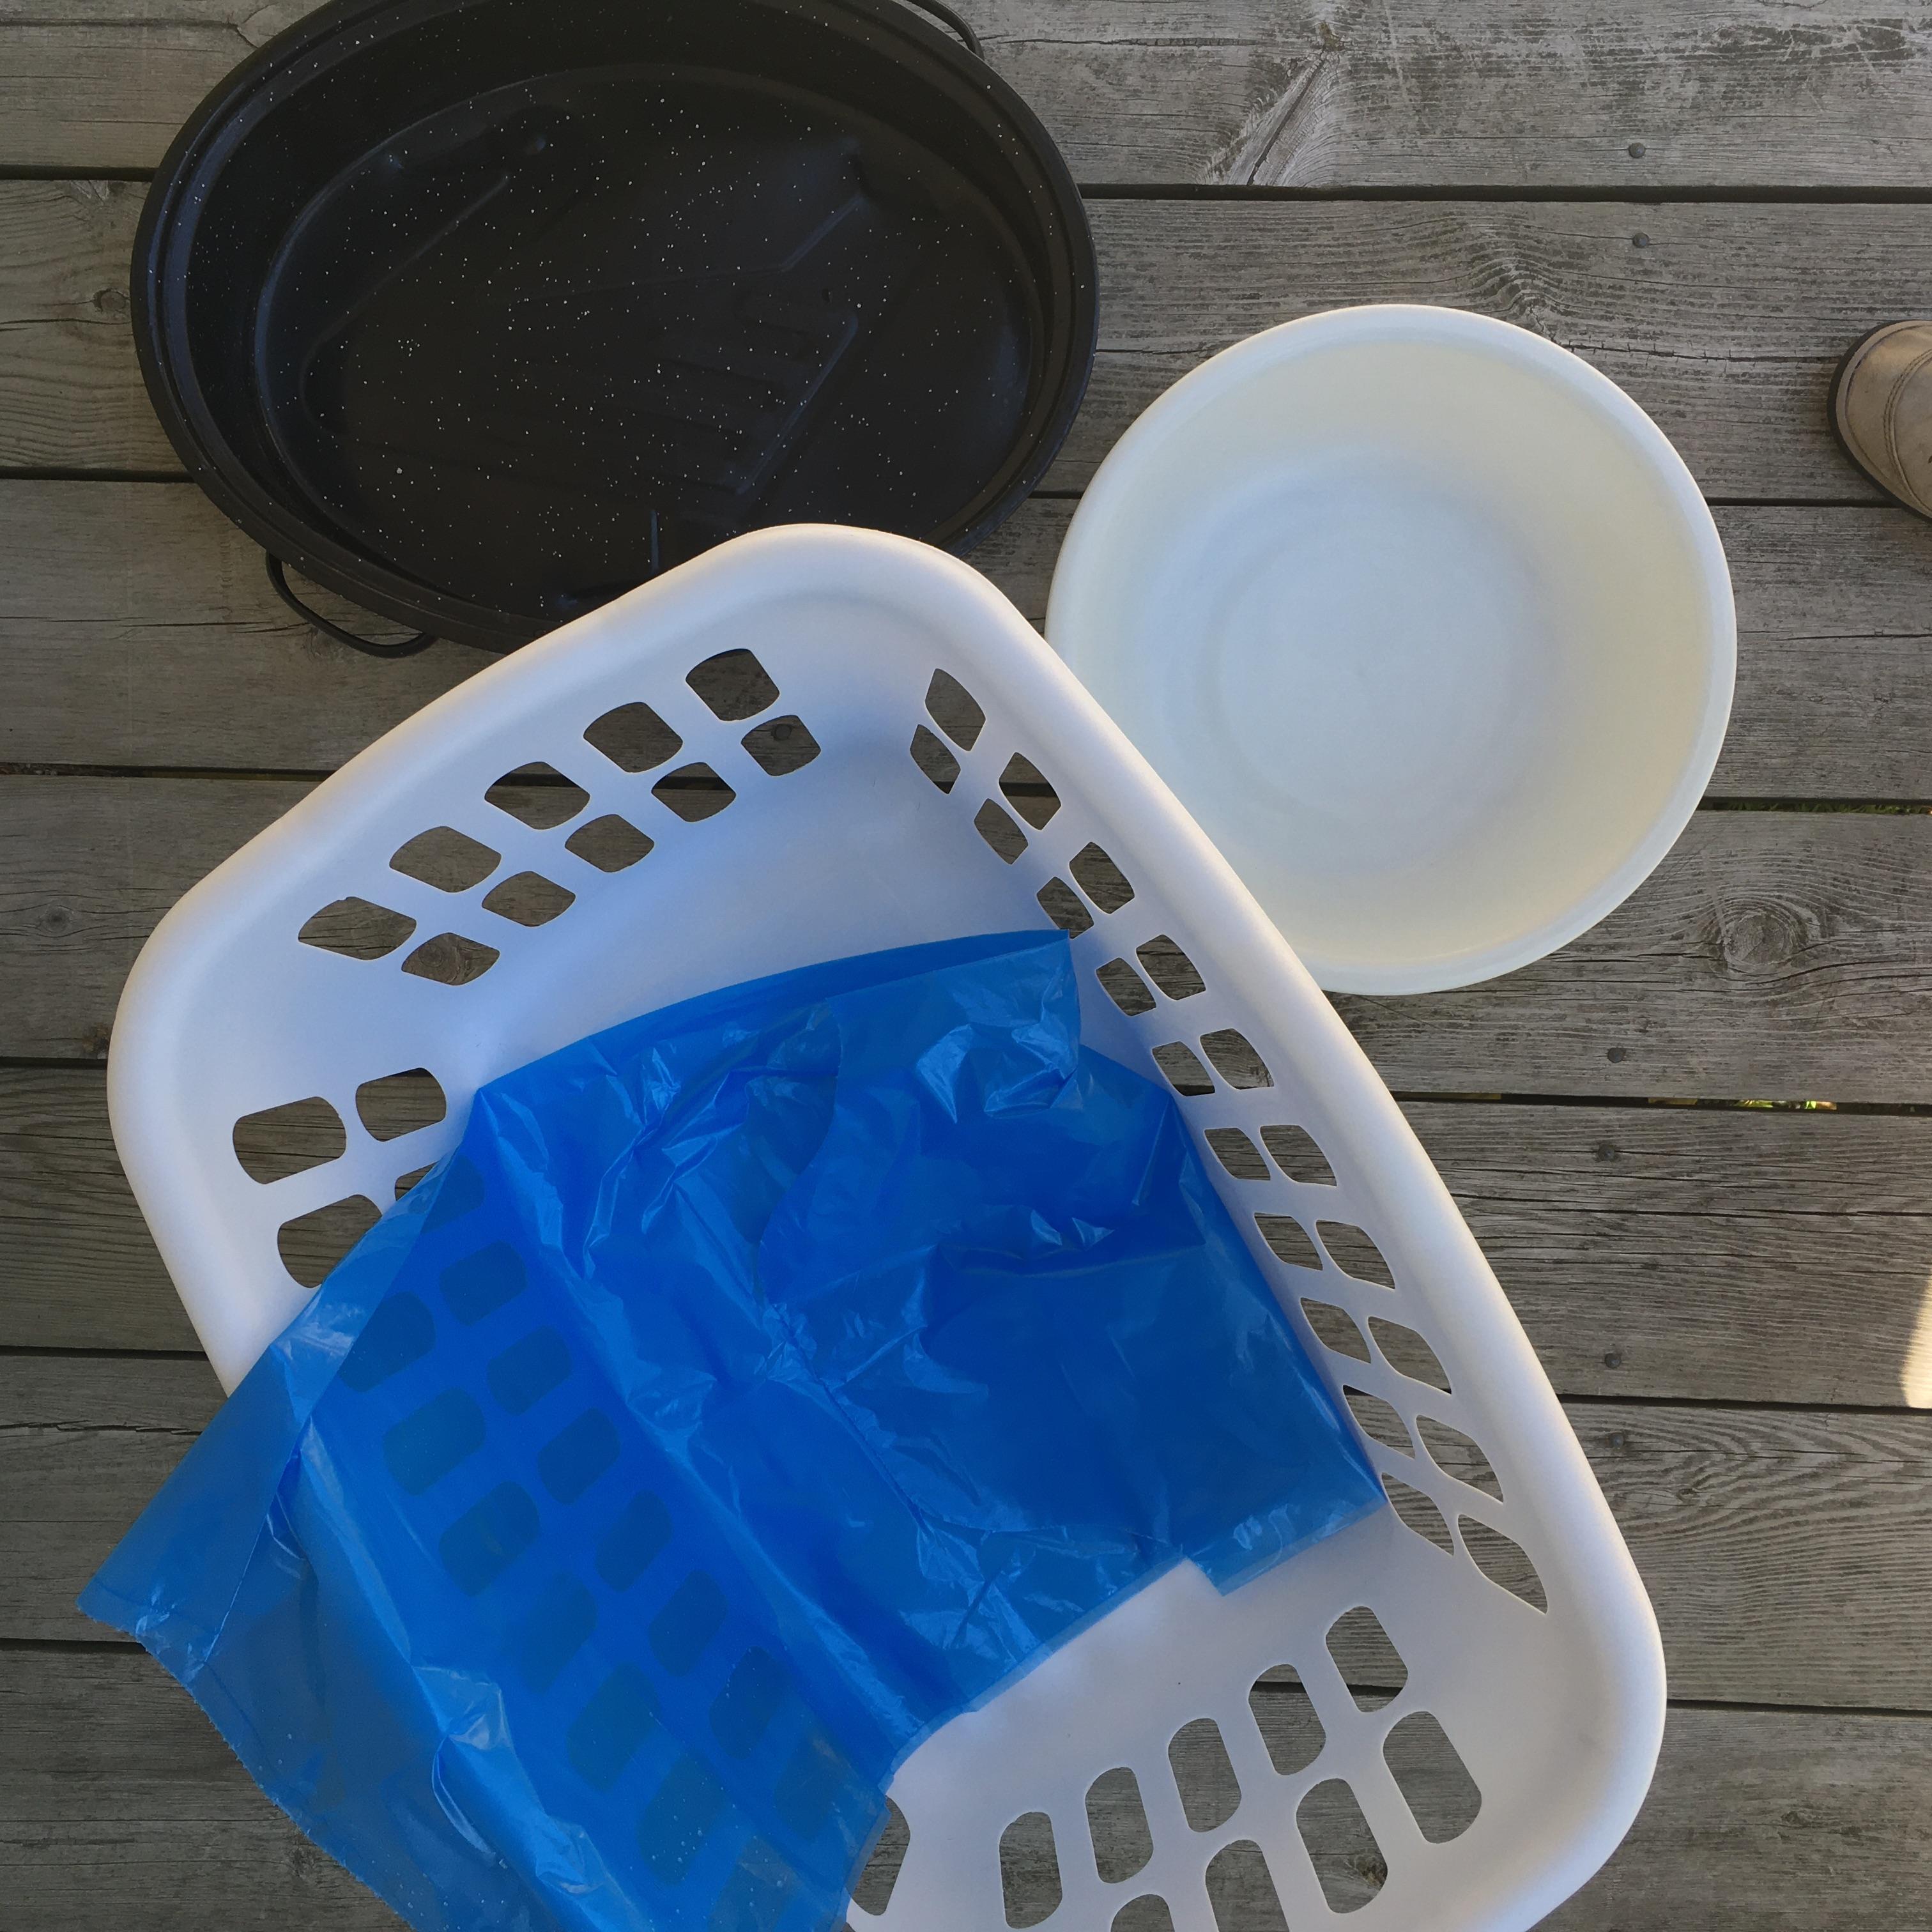 laundry basket, roasting pan, bucket, and blue bag